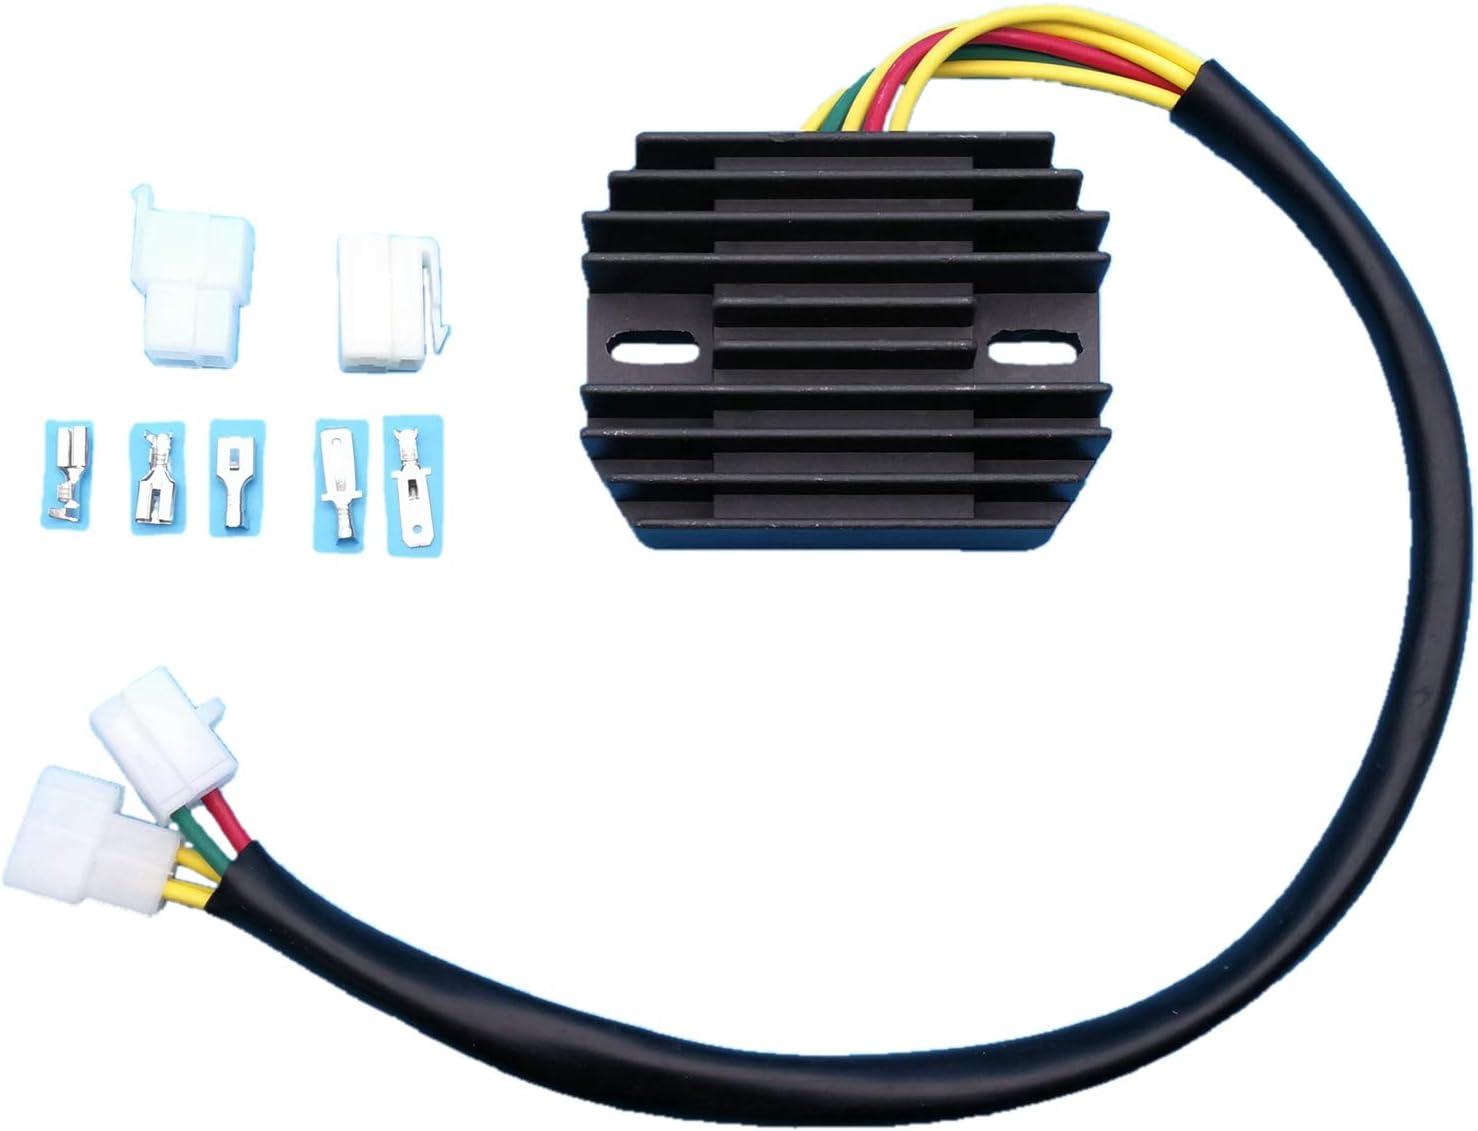 Tuzliufi Challenge the lowest price Voltage Regulator Rectifier for VX800 VZ800 VZ 800 VX Popular products 8